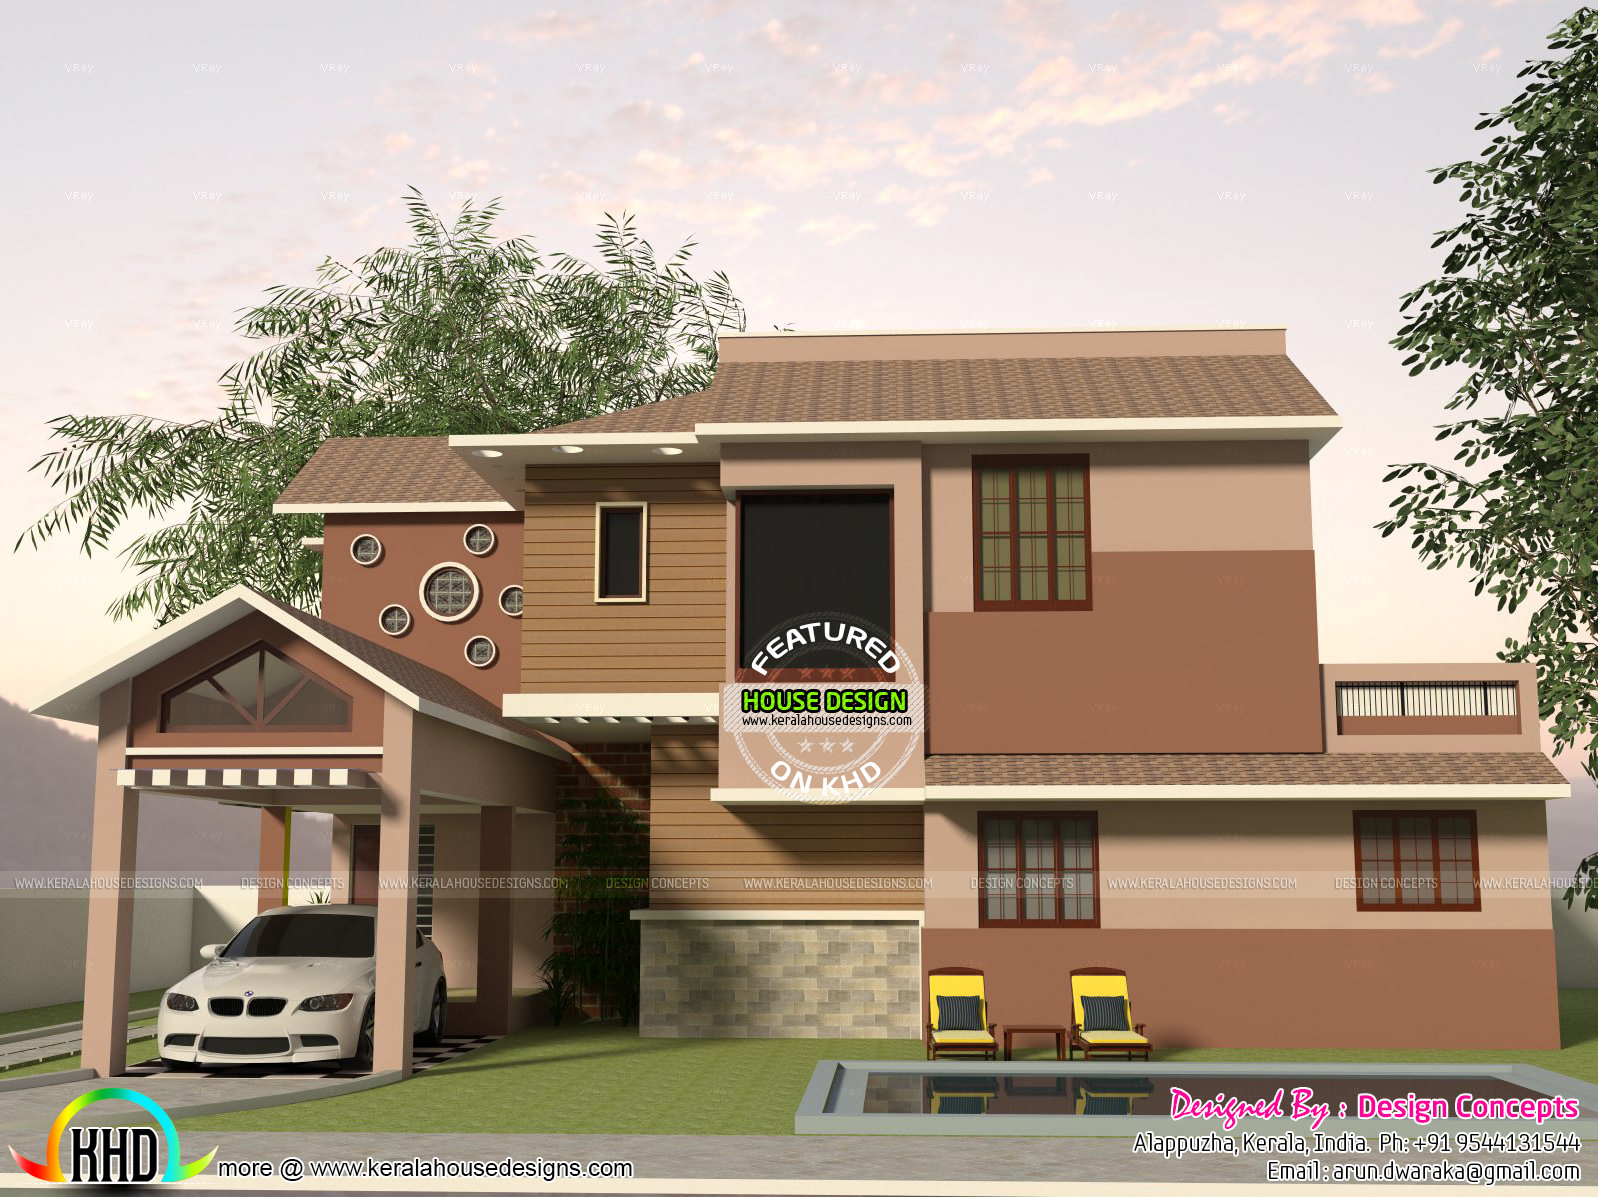 Attractive Home Design Concepts